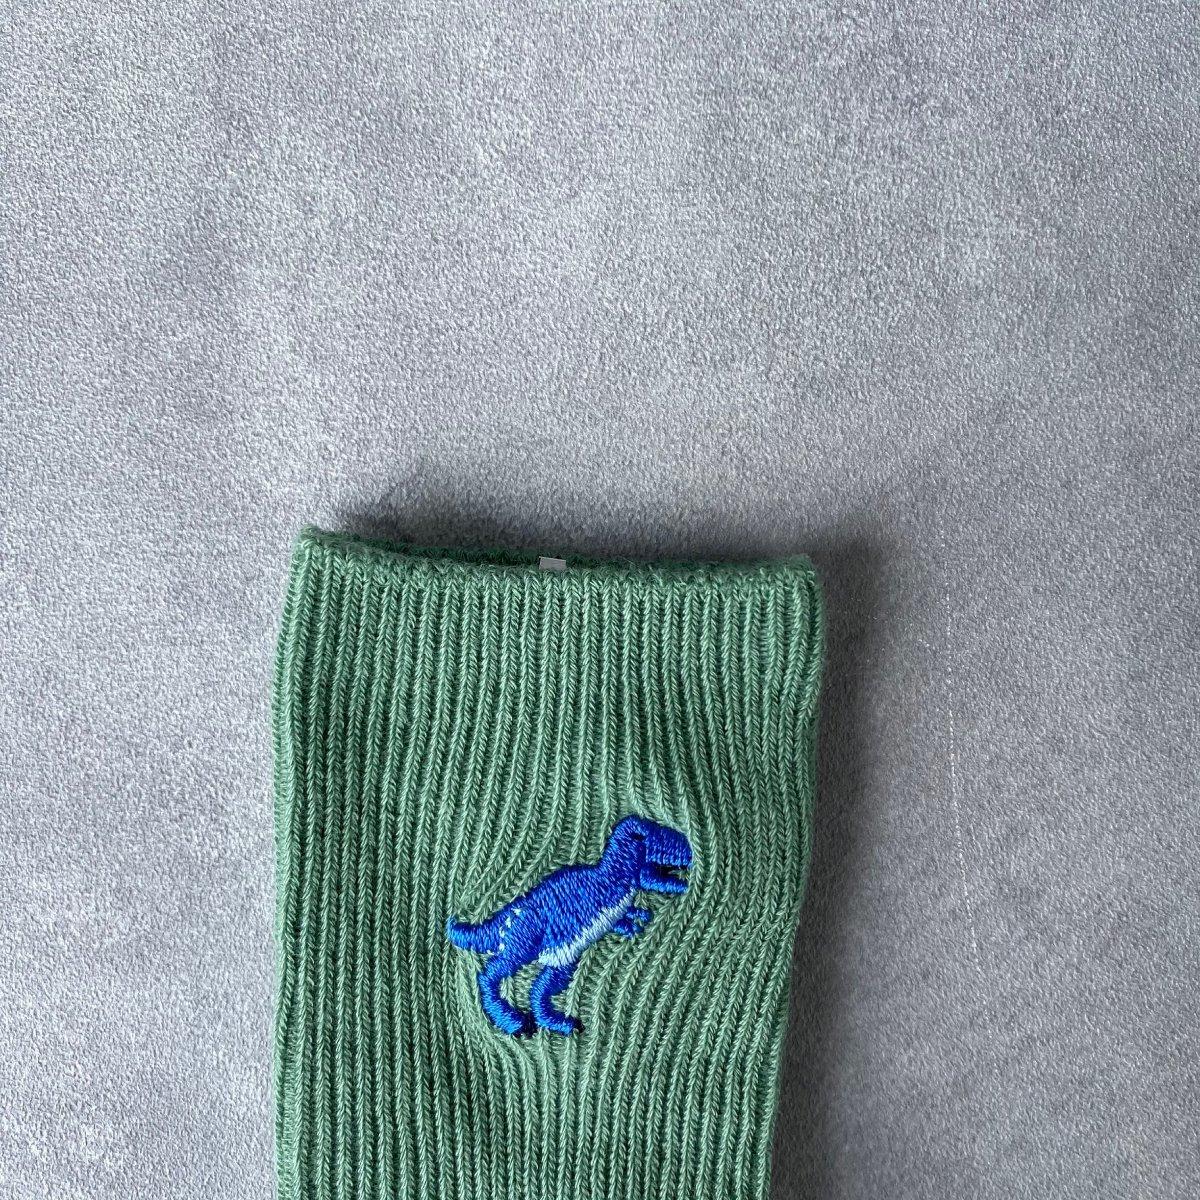 【KIDS】Dino Socks 詳細画像12